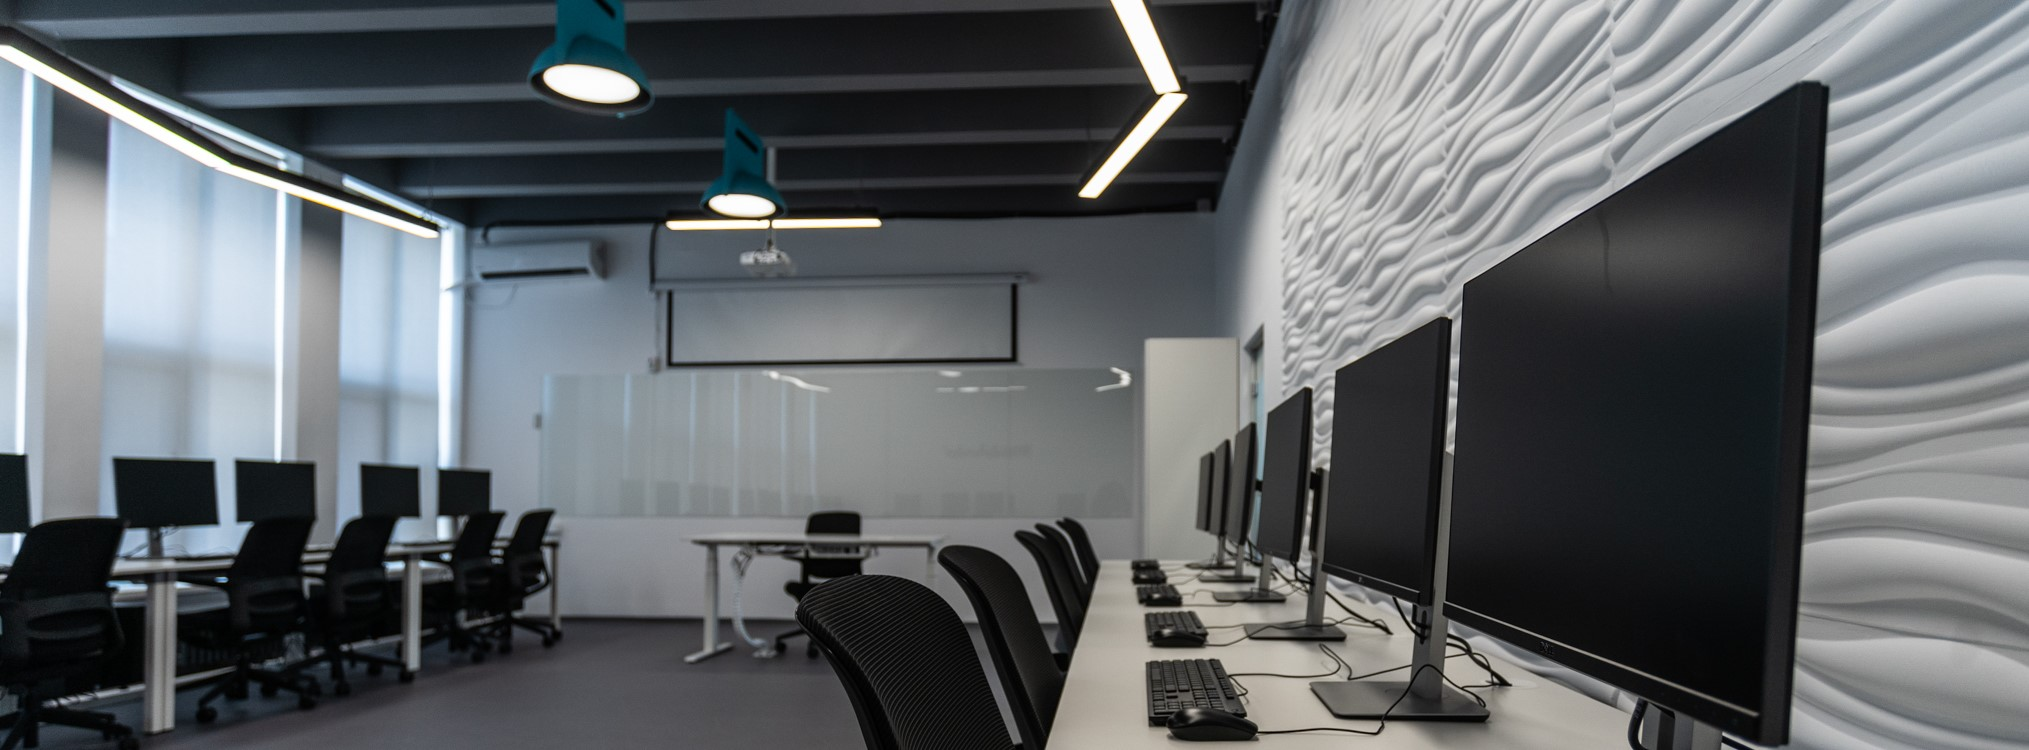 rsz-office-desk-workplace